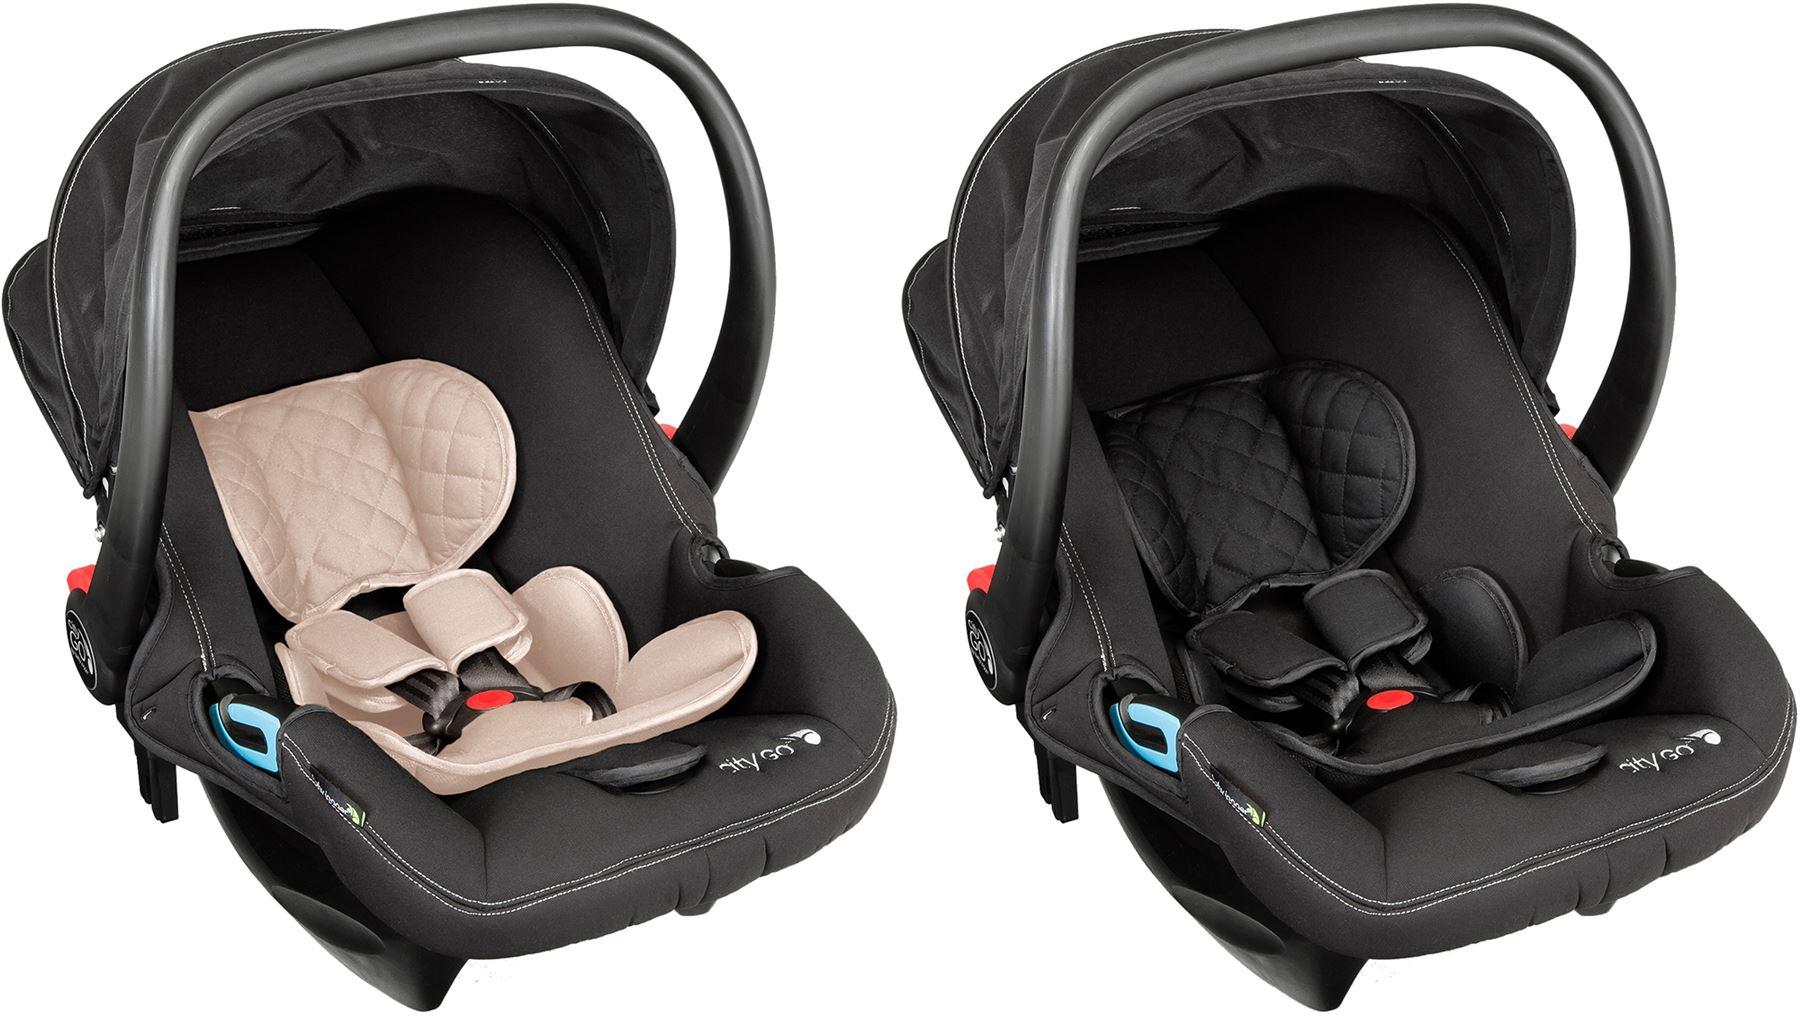 Baby Jogger CITY GO CAR SEAT Group 0+ Baby Travel New | eBay